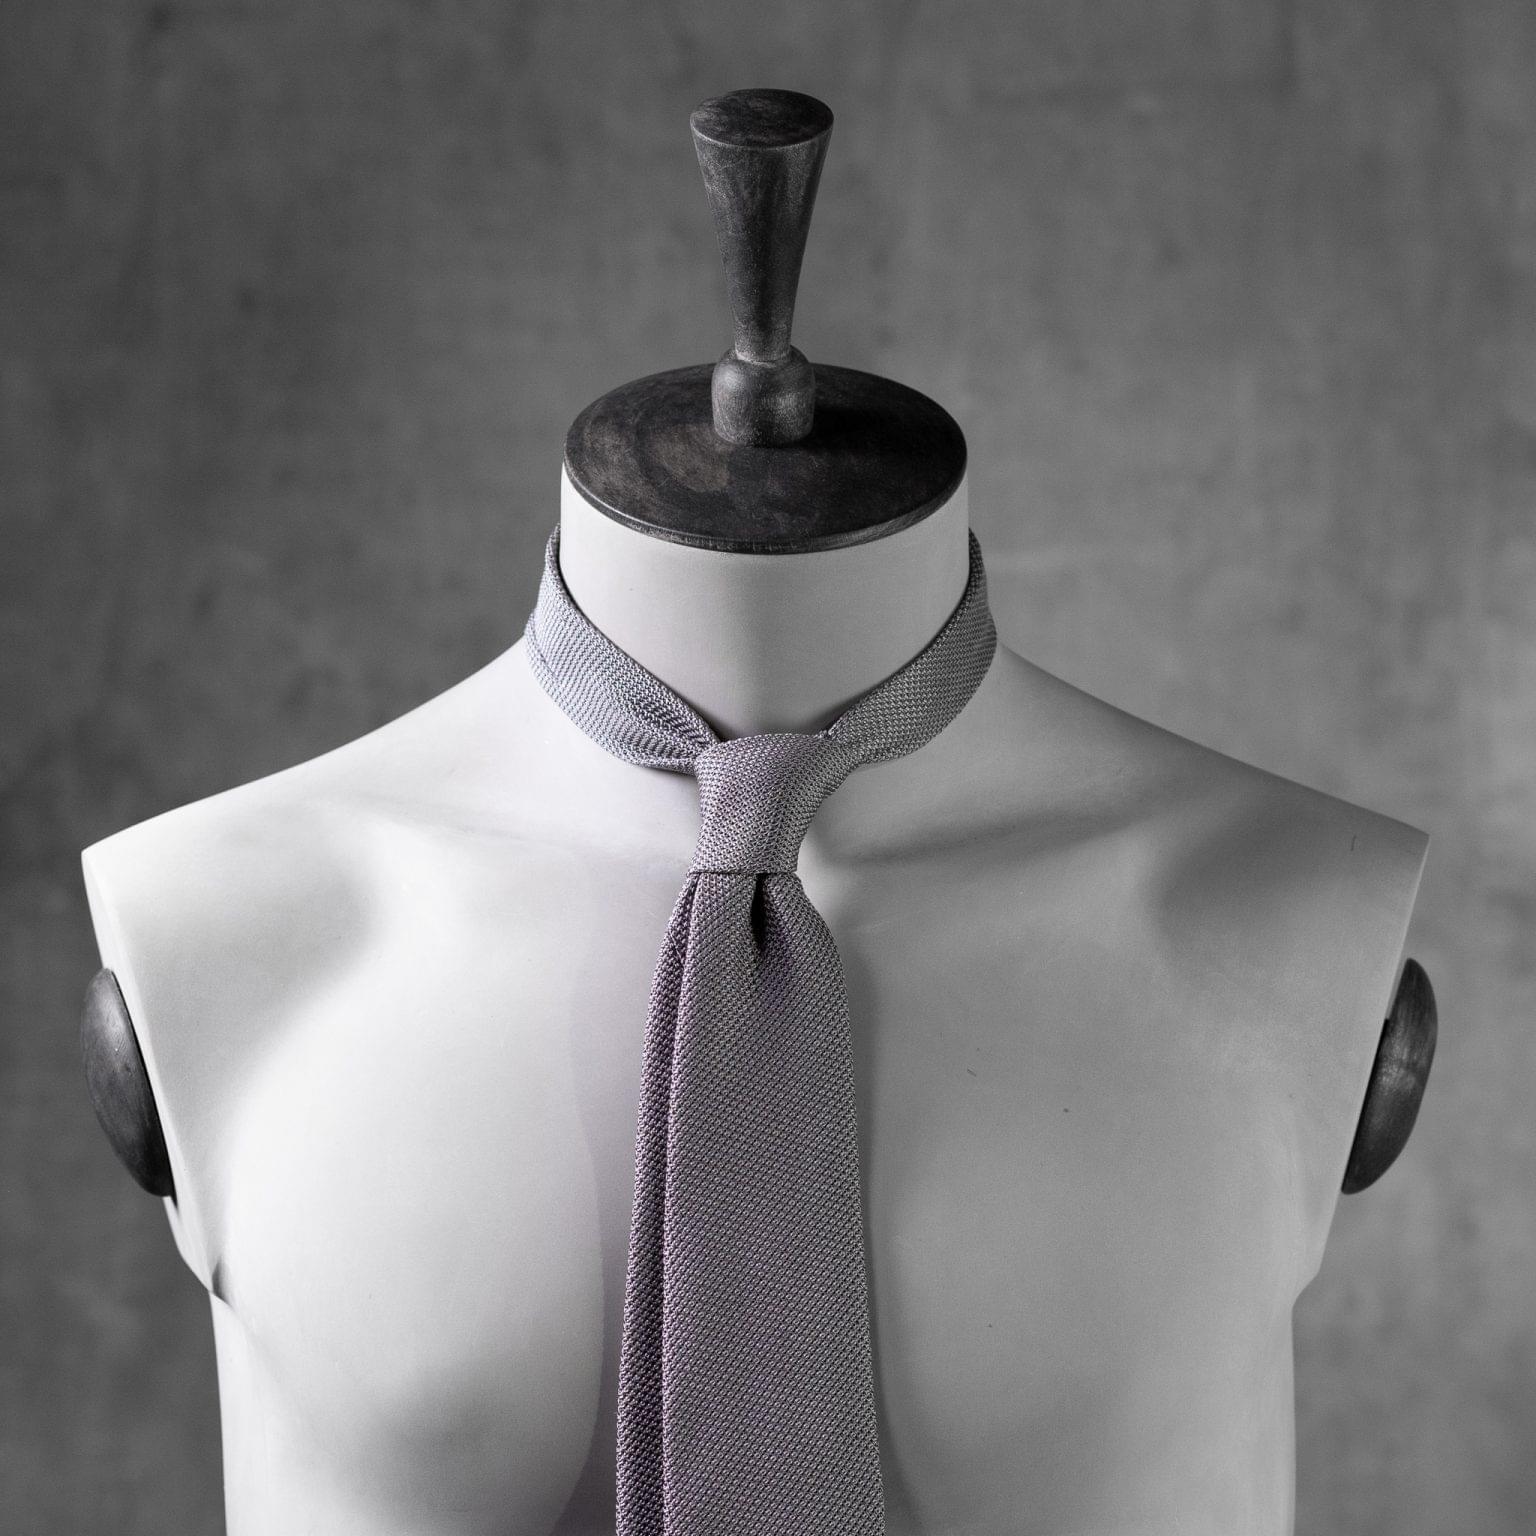 GRENADINE-0151-Tie-Initials-Corbata-Iniciales-The-Seelk-3